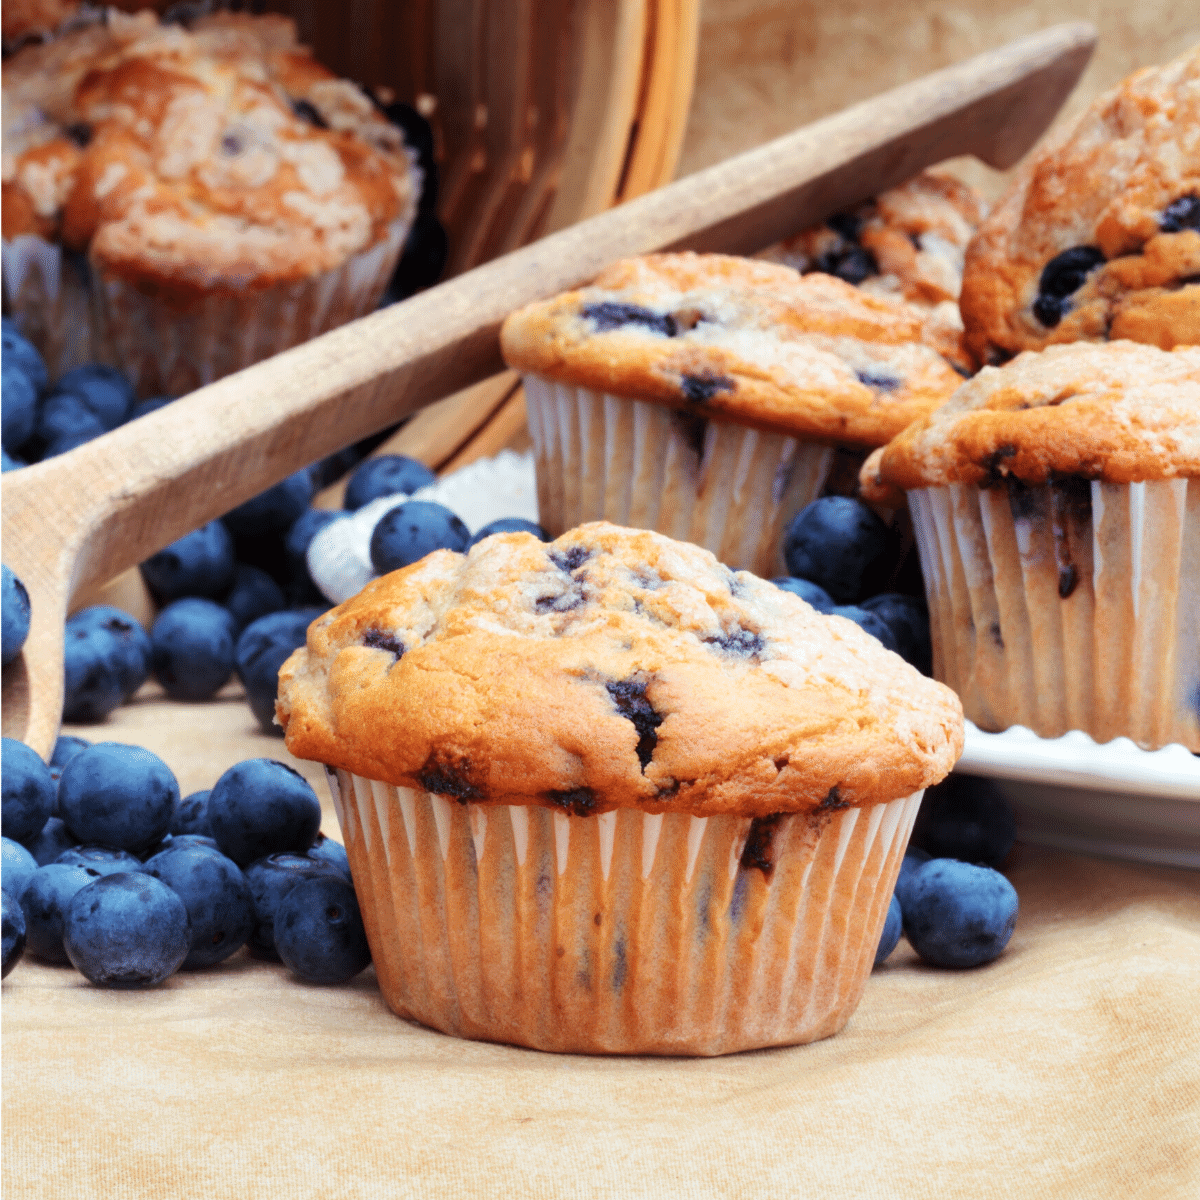 Keto Lemon Blueberry muffins recipe gluten free low carb